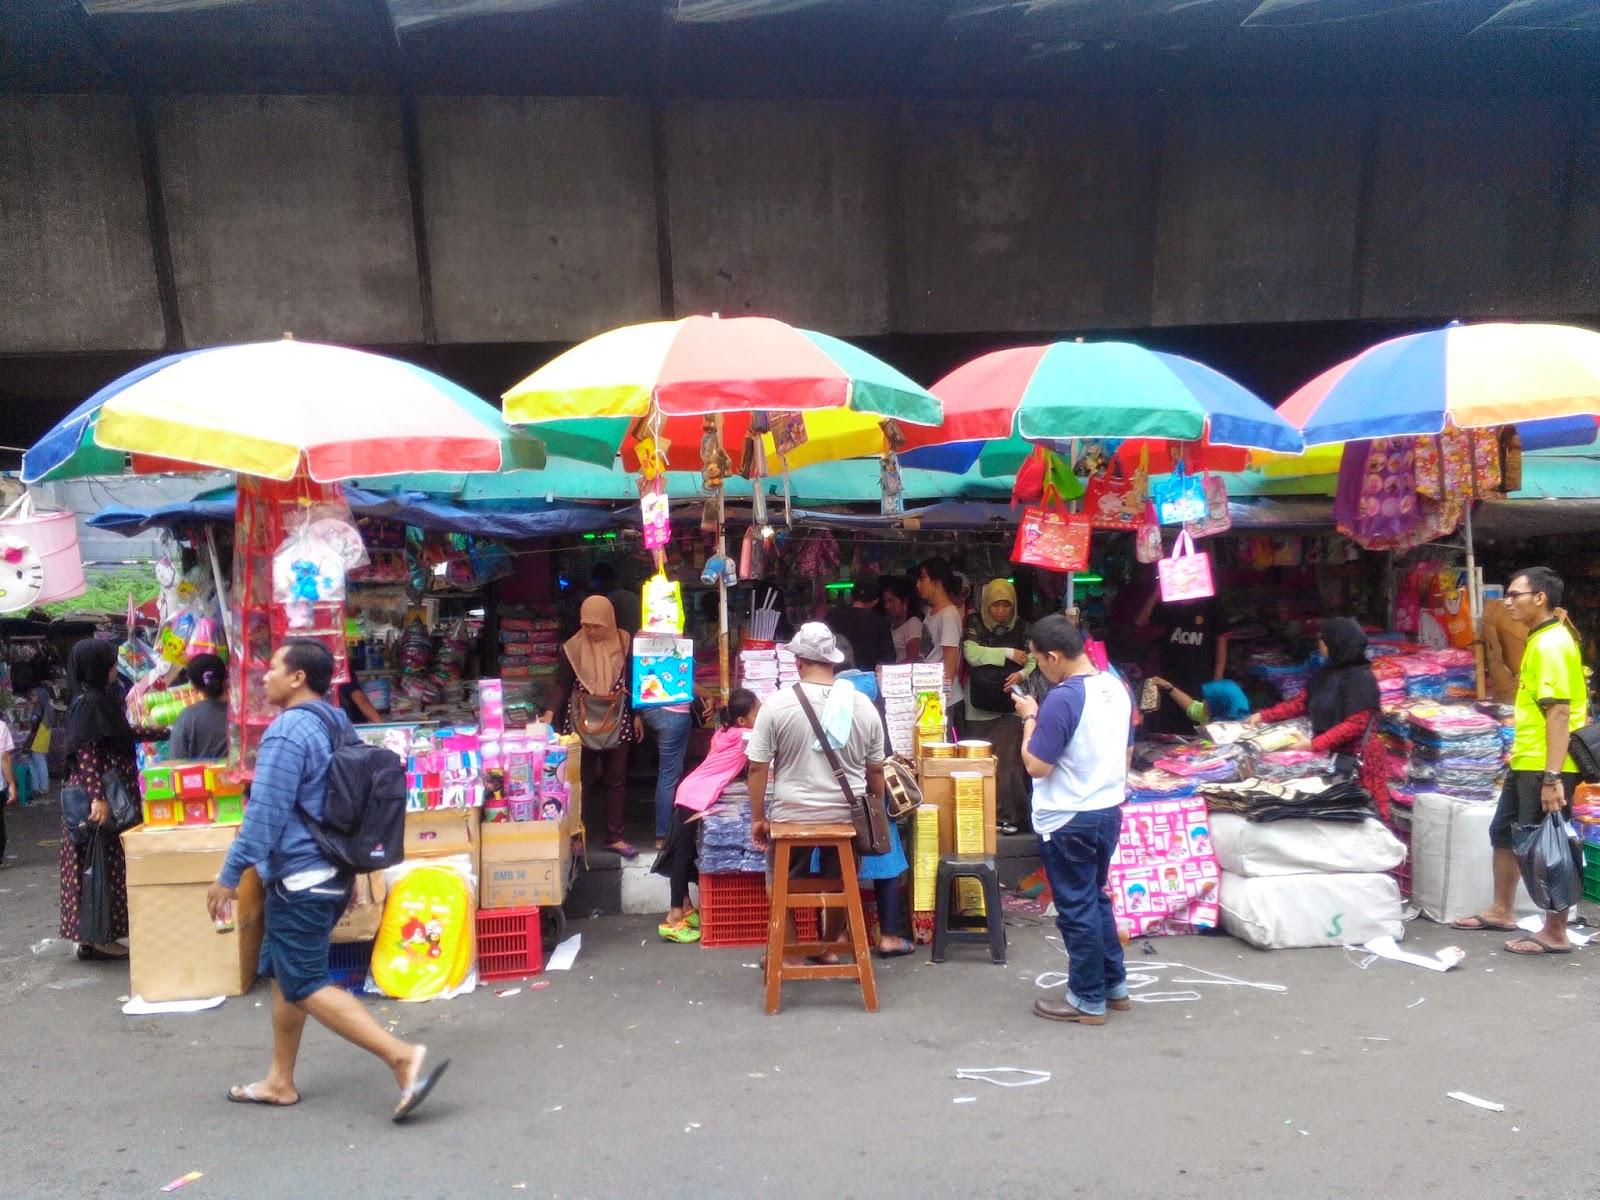 Squishy Di Pasar Asemka : 5 Tempat Belanja Pakaian dan Aksesoris Paling Murah di Jakarta - Berita Liputan